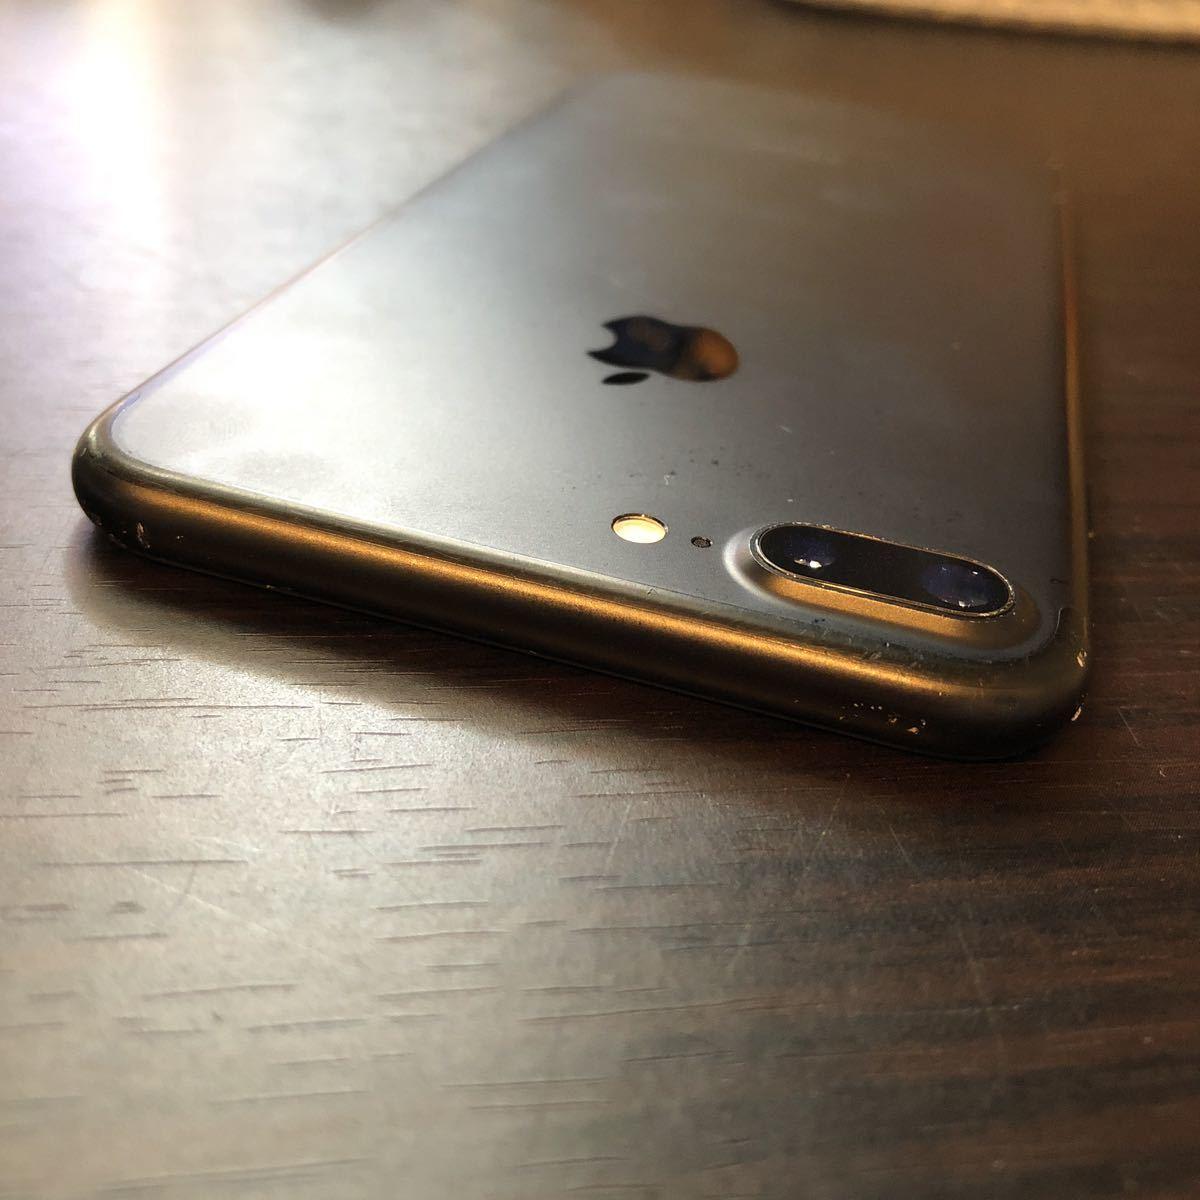 iPhone7Plus 256GB SIMフリー ブラック 中古良品 [1505]_画像5